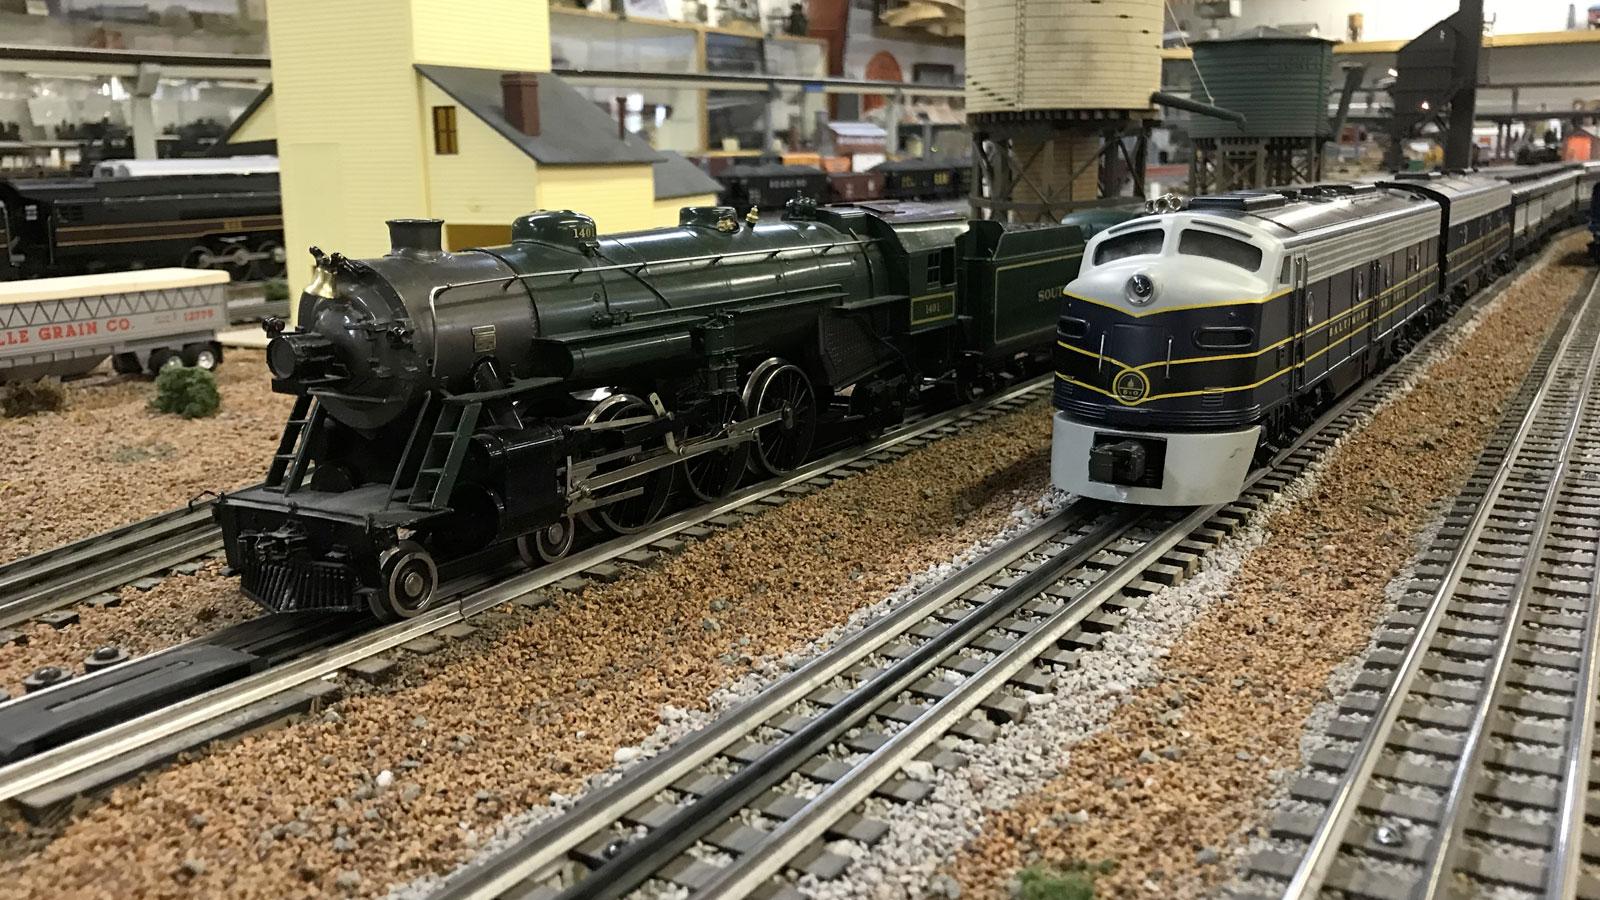 Gadsden-Pacific DivisionToy Train Operating Museum | Tucson